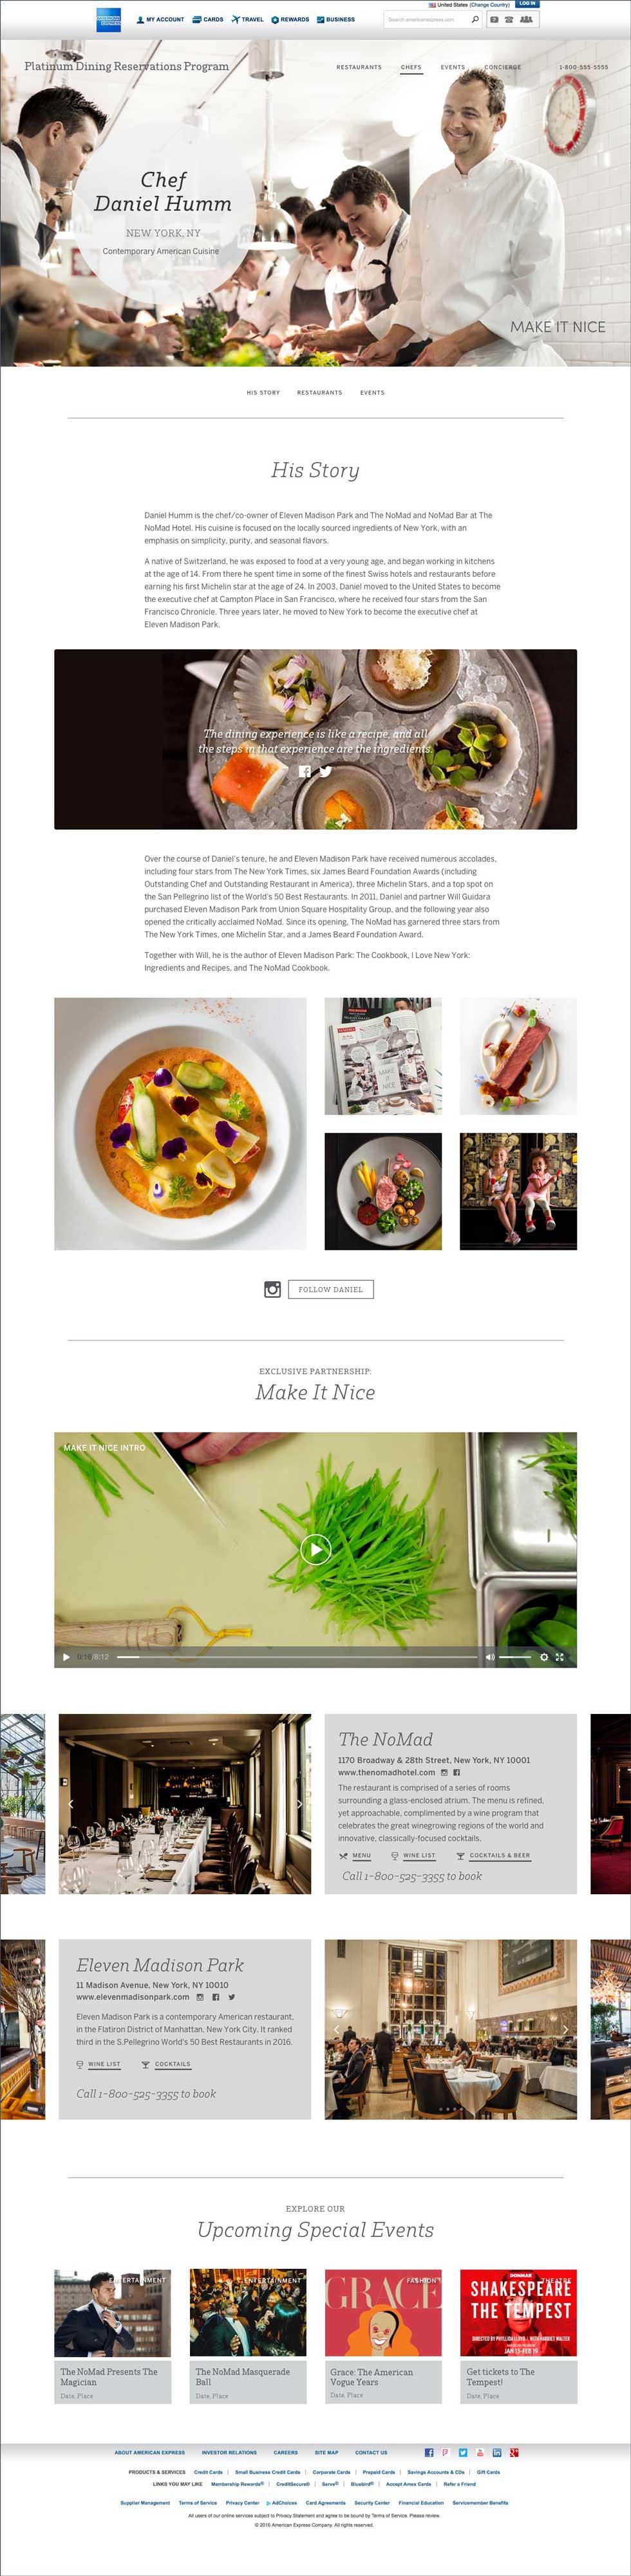 4.Chef-Detail.jpg